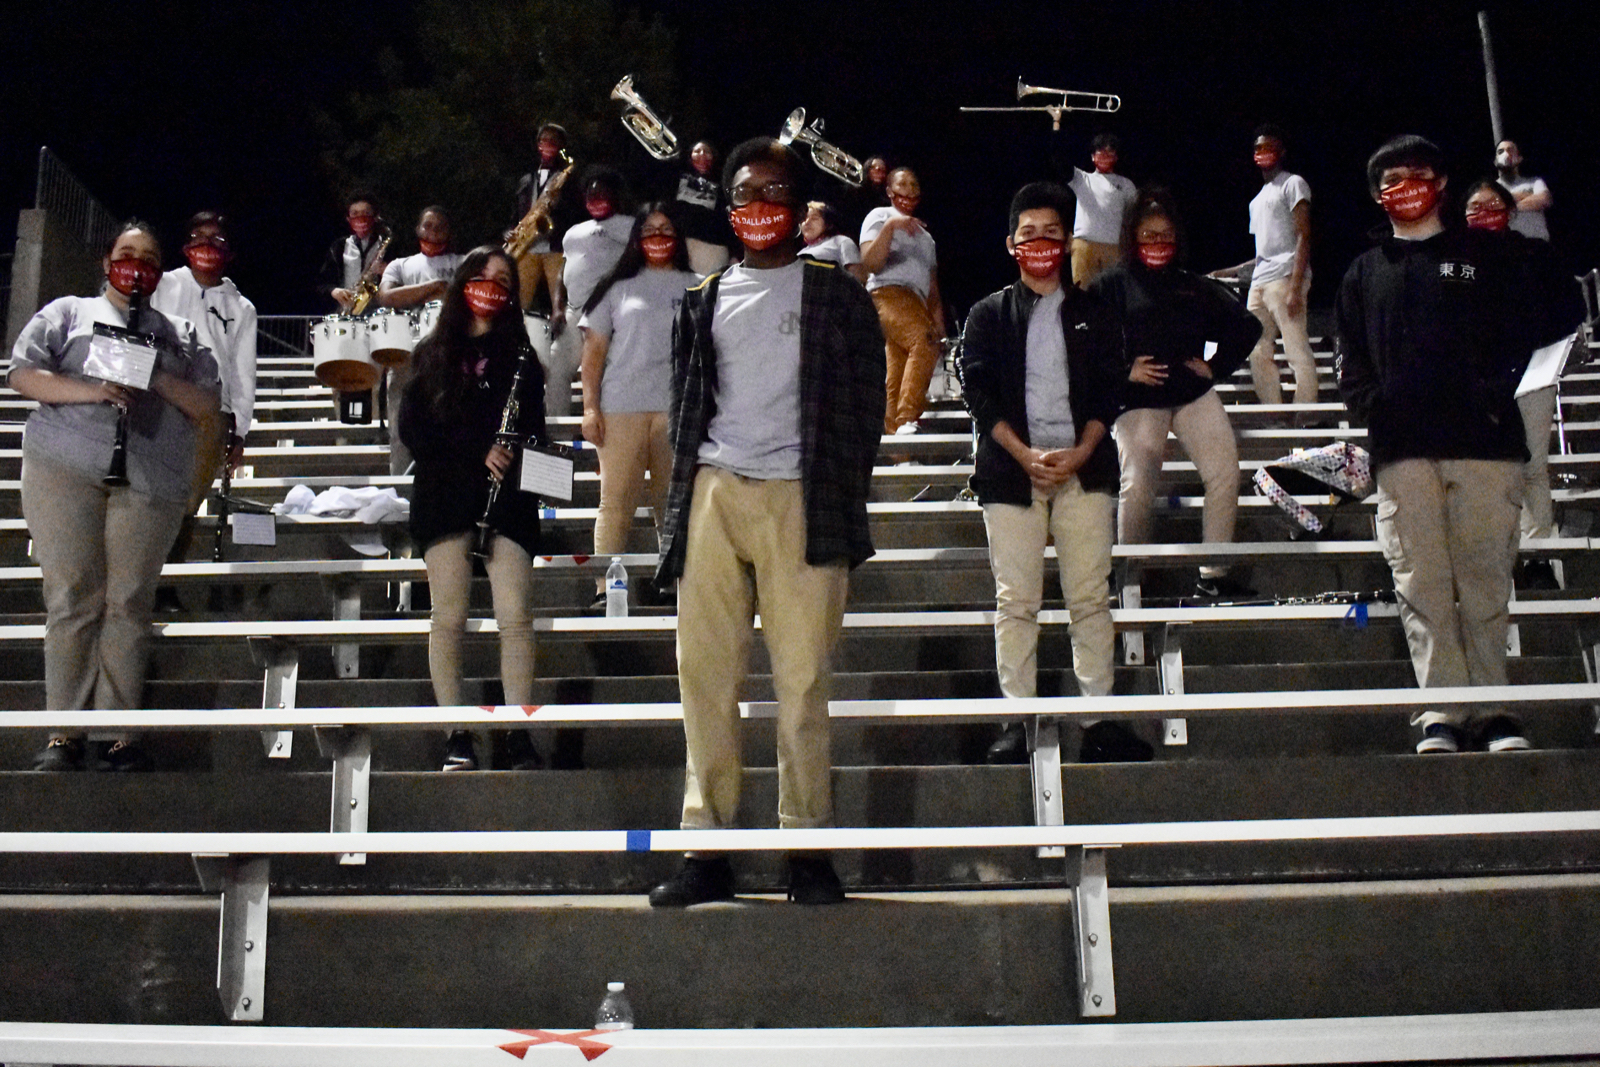 Photo gallery: North Dallas marching band at Lincoln game — Nov. 6, 2020